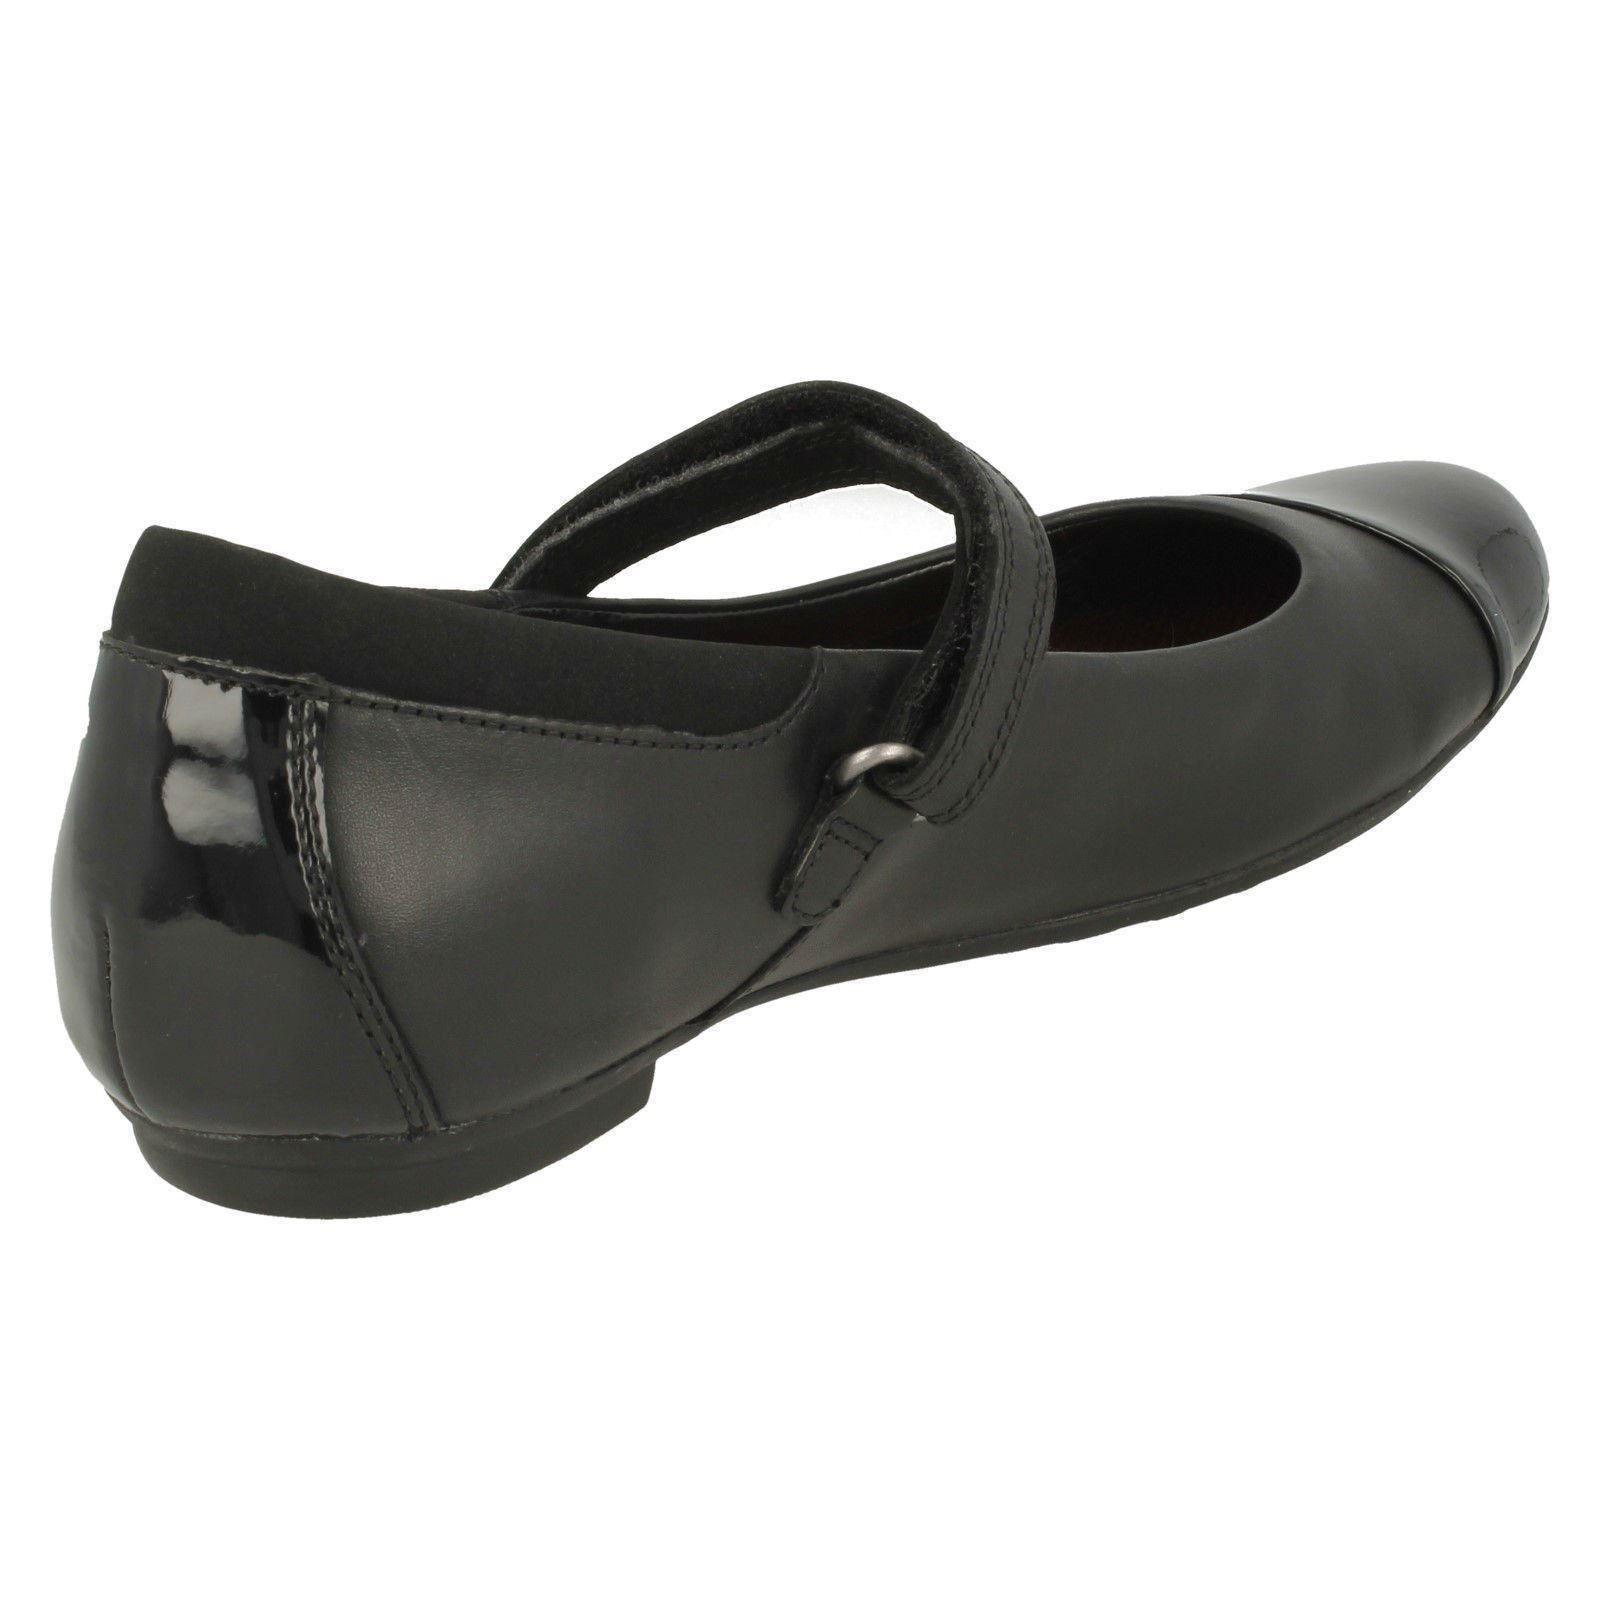 Girls Clarks MaryJane Style Hook /& Loop Fastening Leather School Shoes Tizz Talk